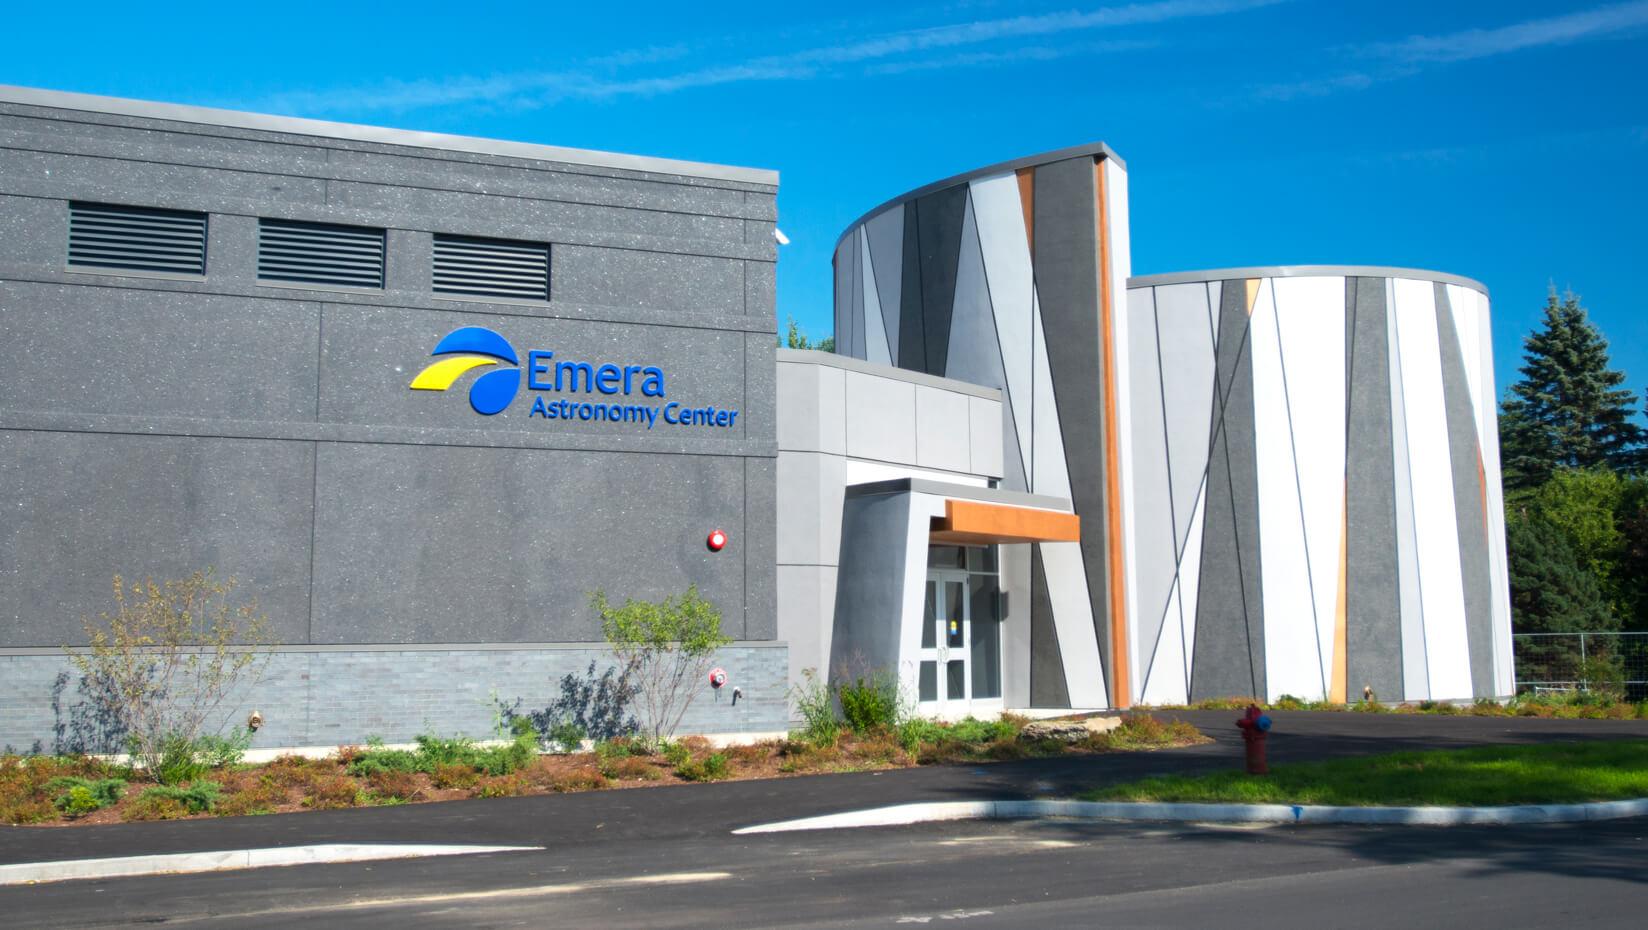 Emera Astronomy Center